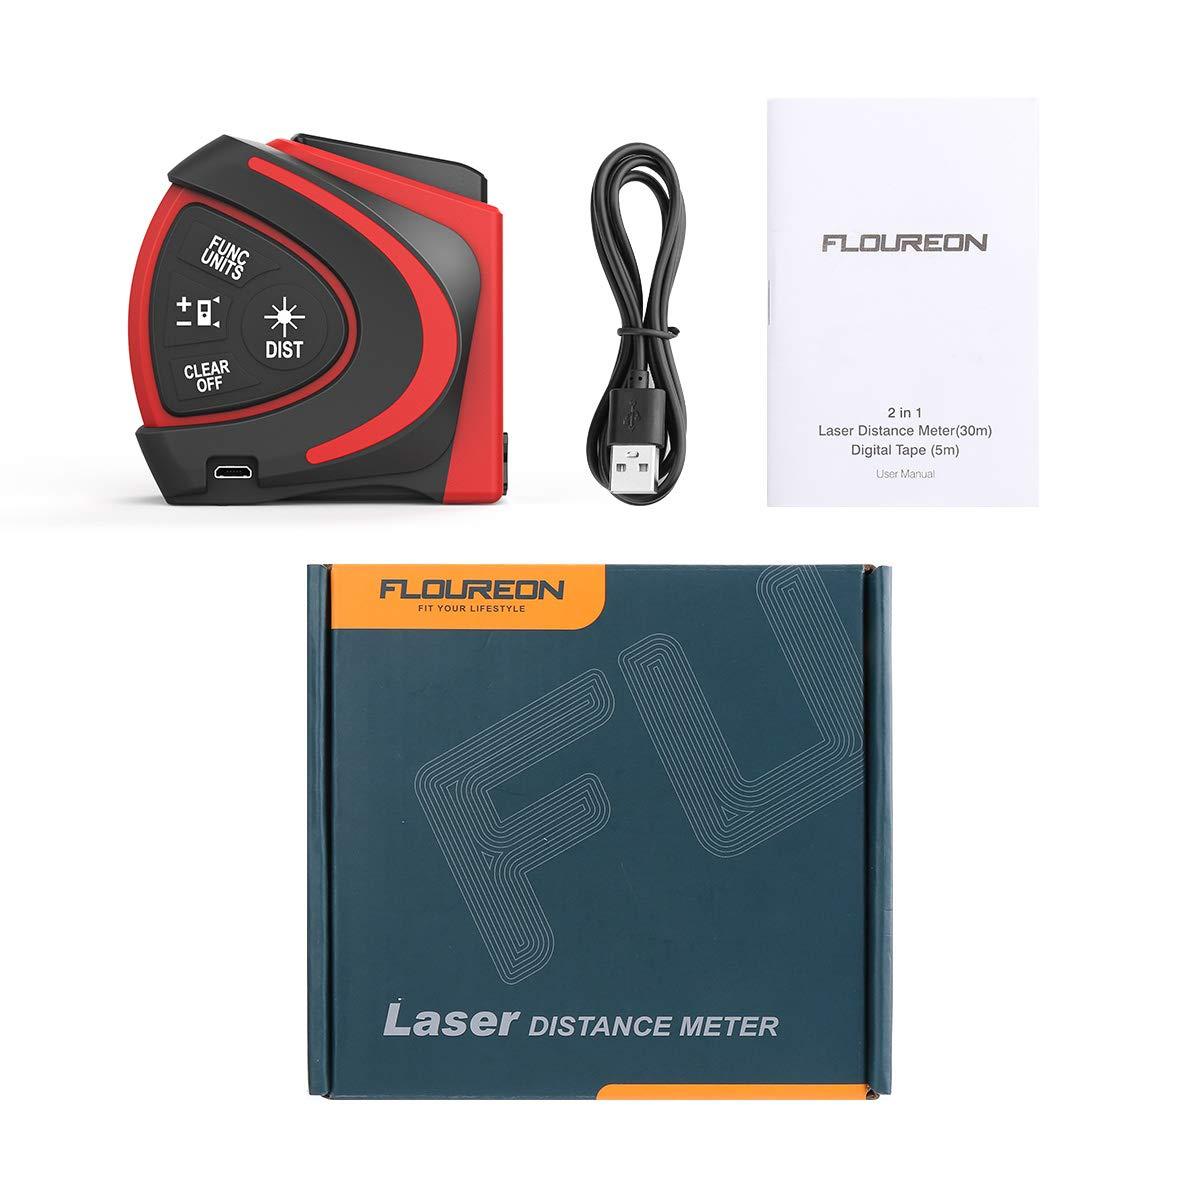 Metri a Nastro Laser Protezione Antipolvere e IP54 Display LCD Misura Nastro 5m // 16ft FLOUREON 2 in 1 Metri a Nastro Laser Digitale con Misurazione Laser 30m // 98ft Carica USB